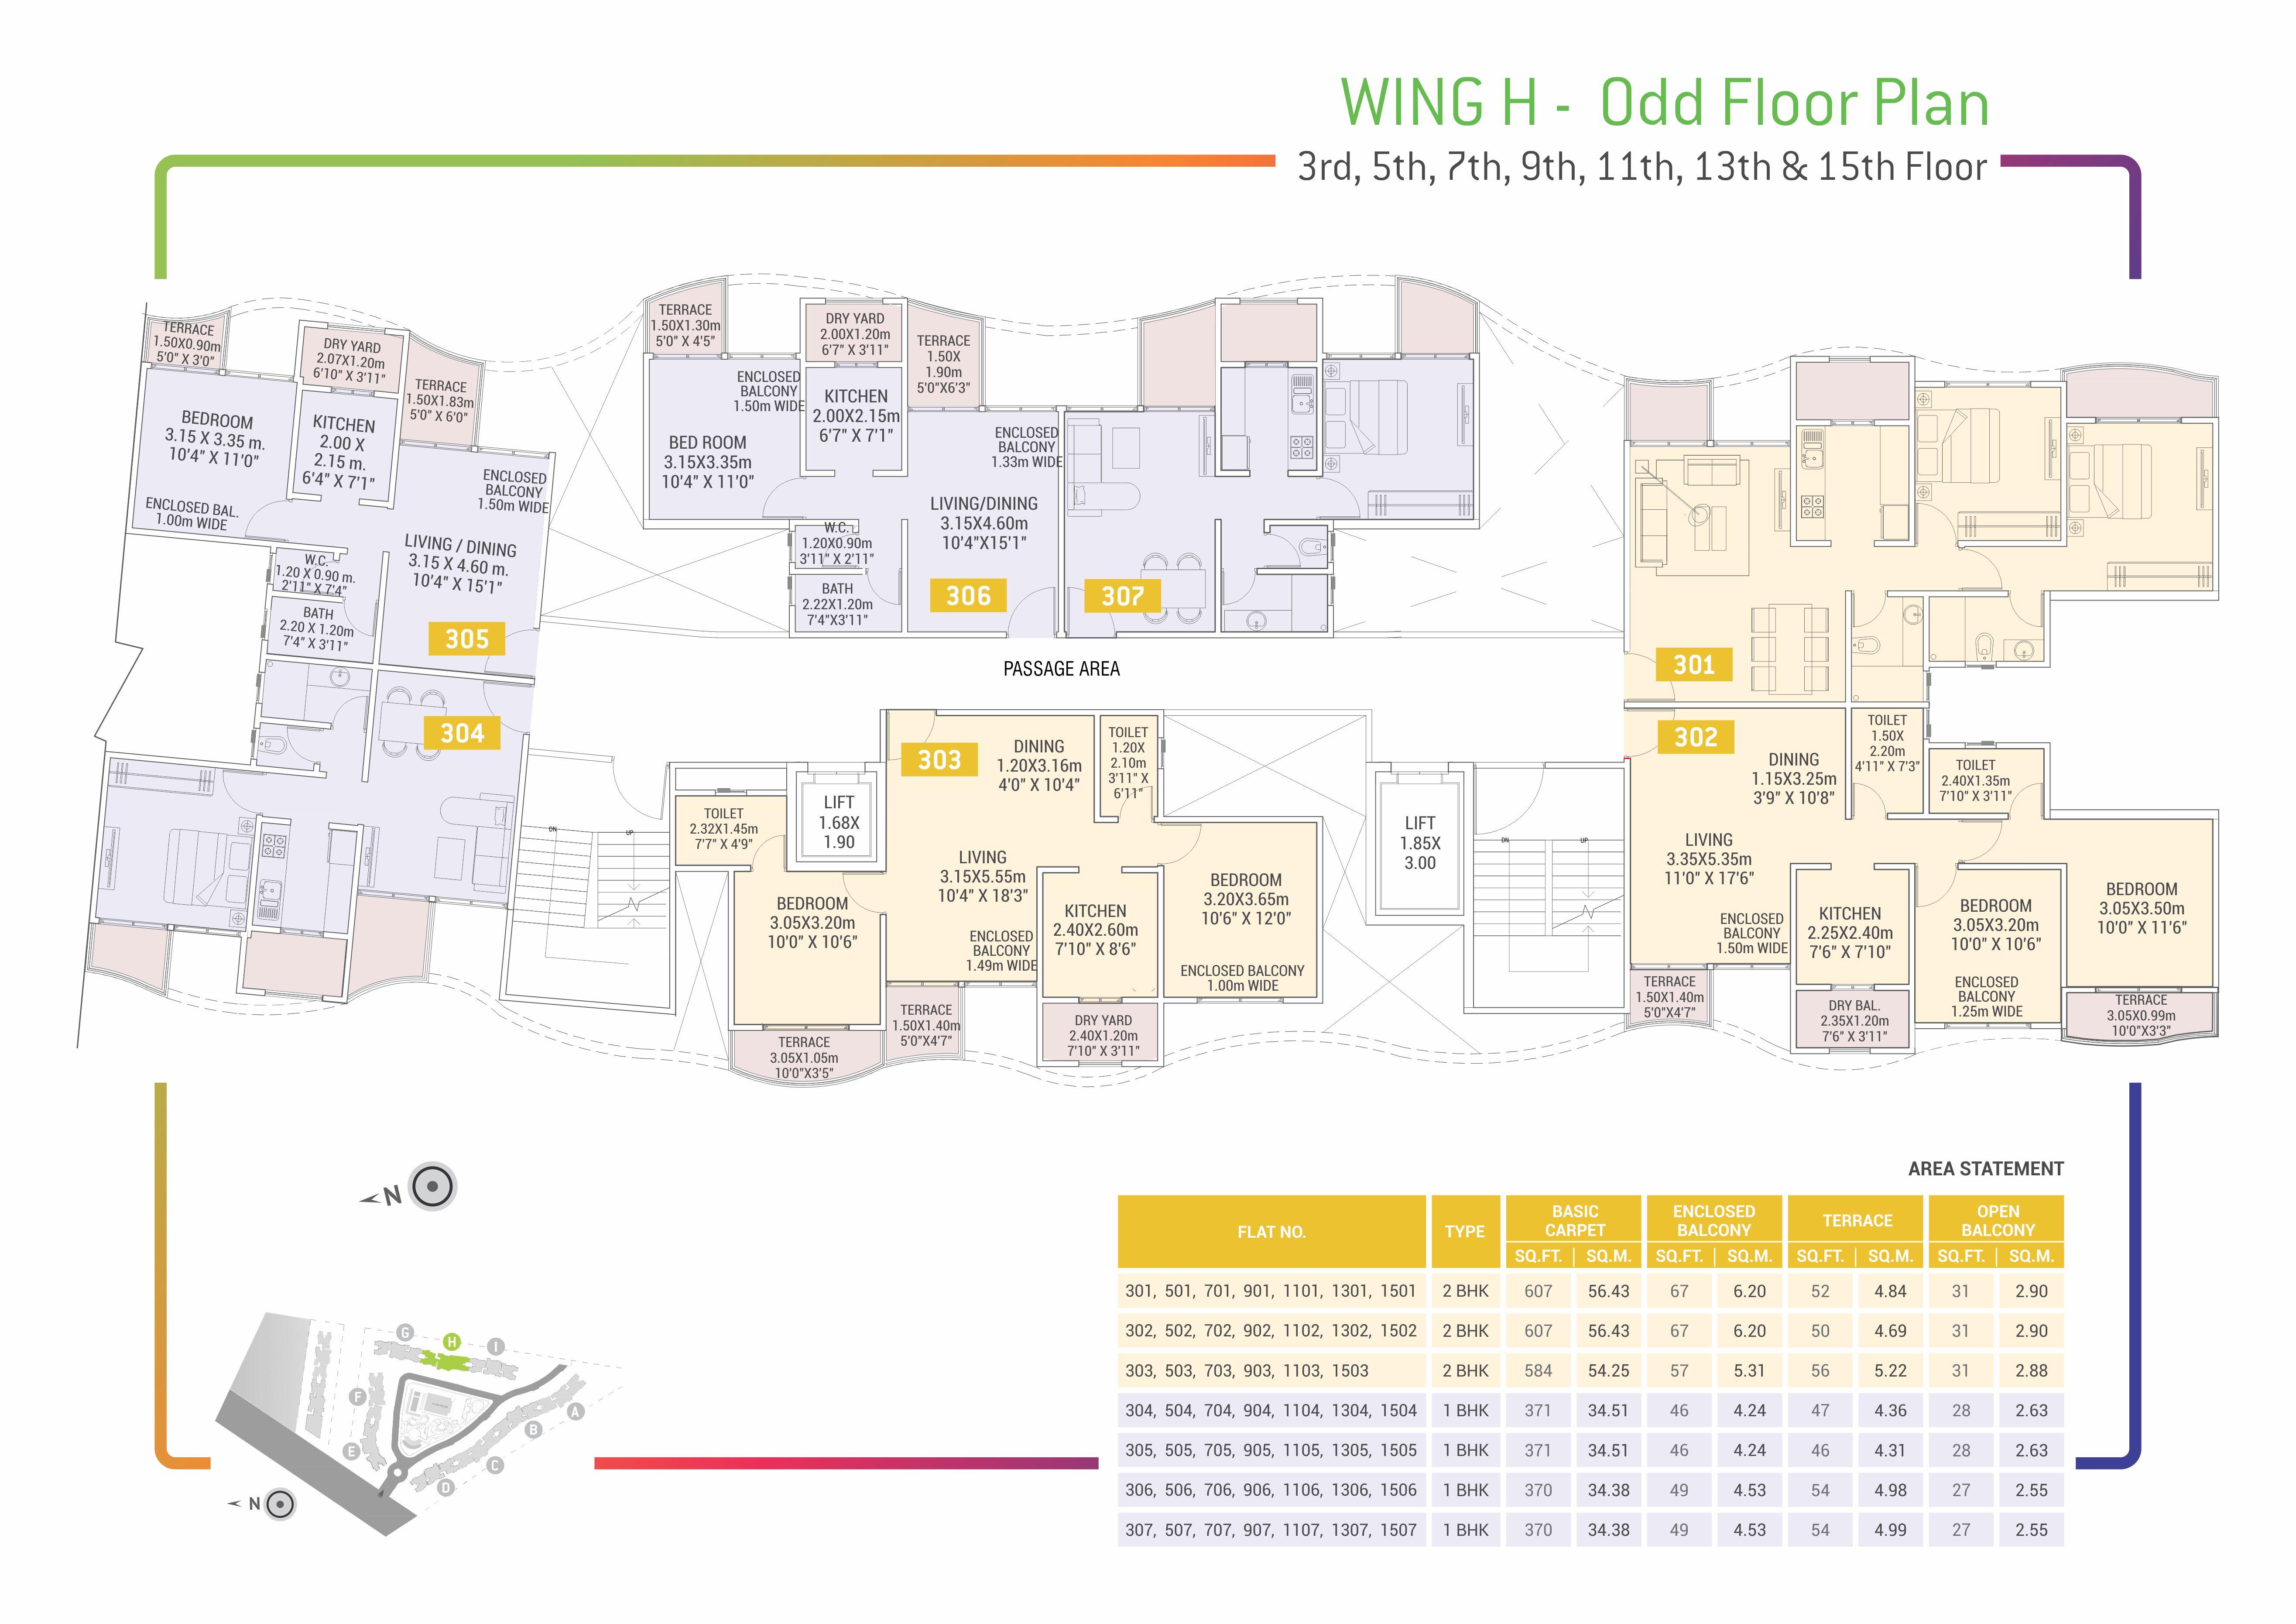 Urban Life Floor Plans - H - Odd